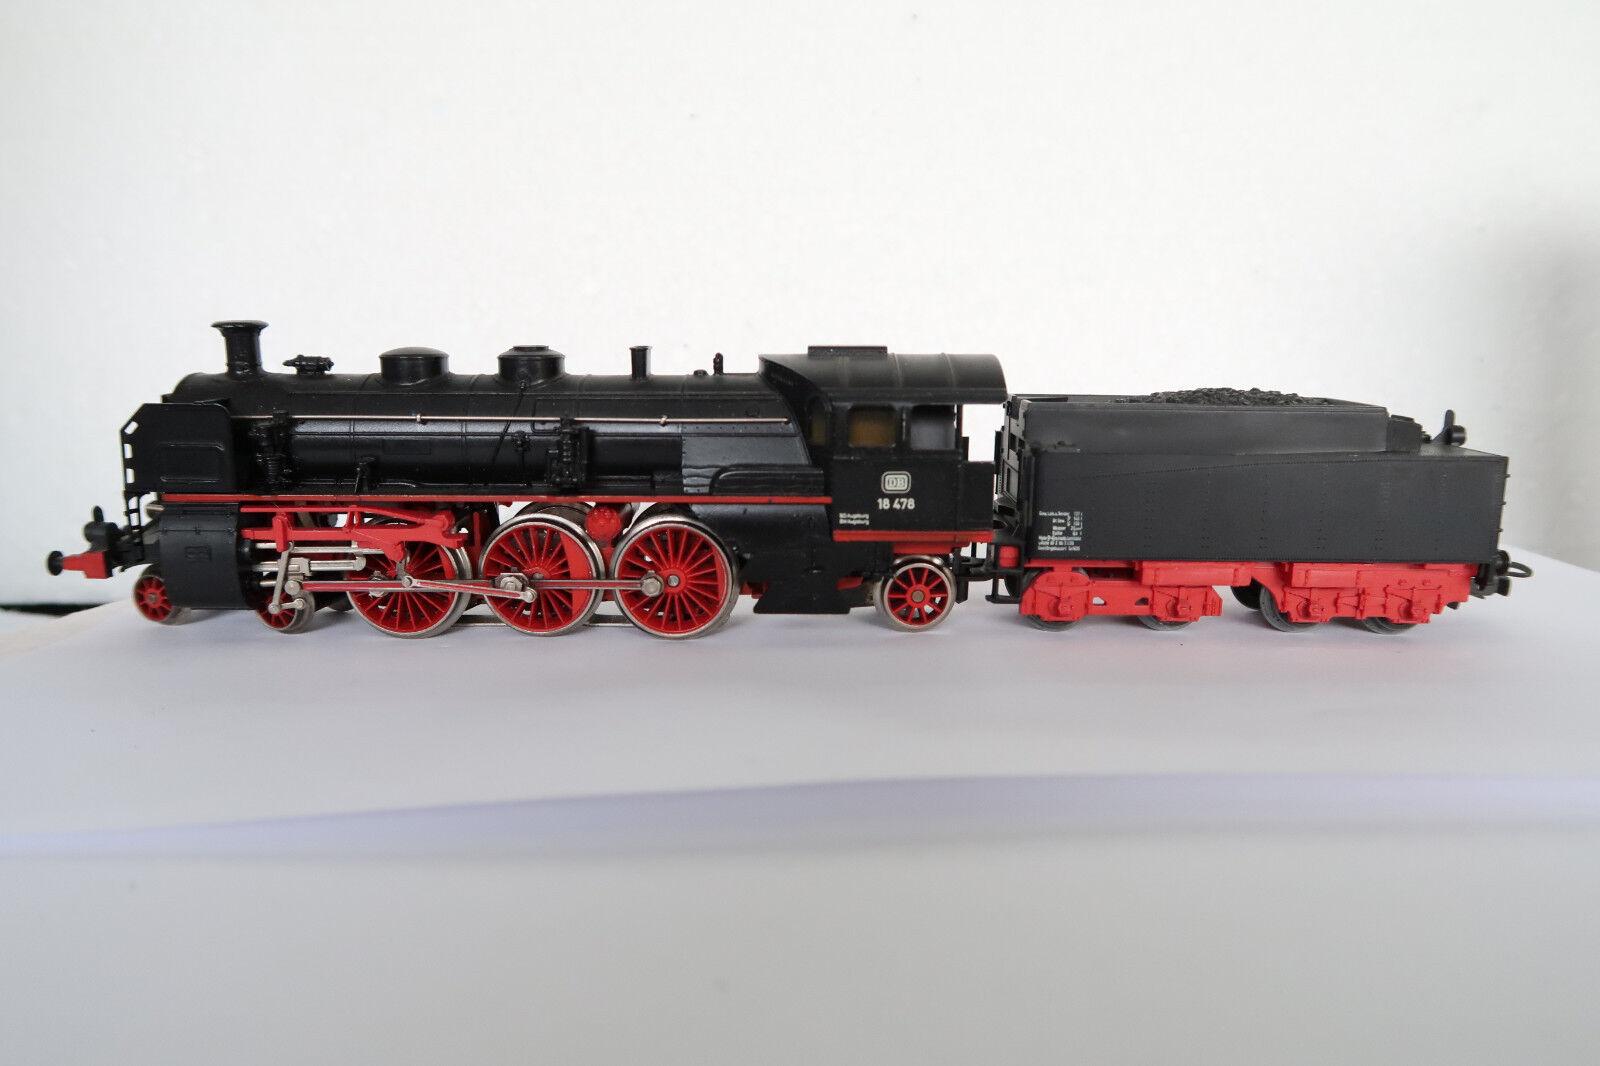 HO/AC 3093 a vapore Lok btrnr 18 478 DB  co/364-65r7/13